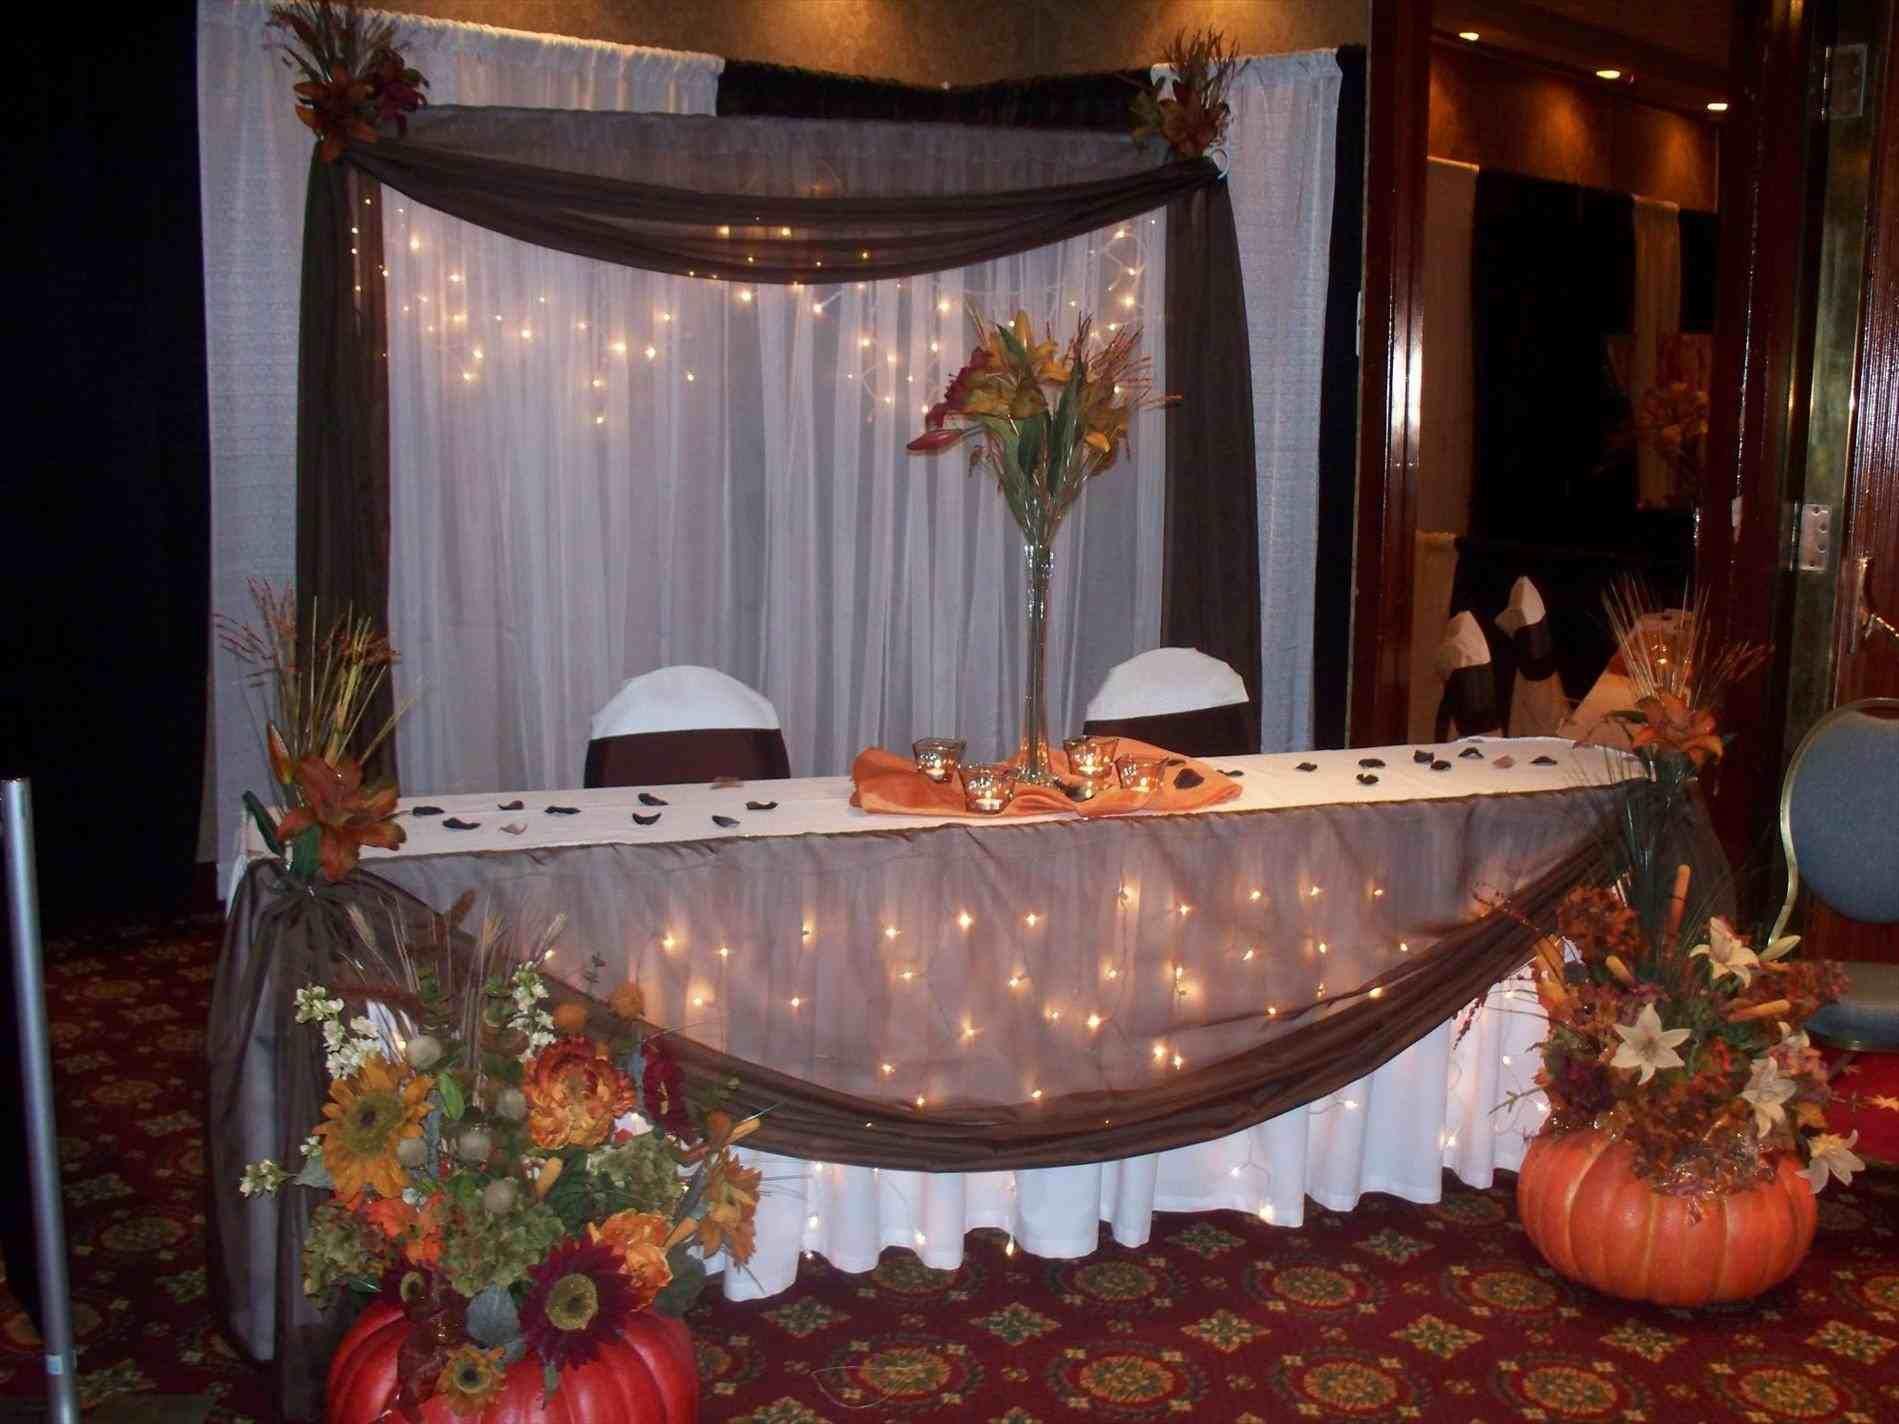 Rustic Fall Wedding Ideas On A Budget Wedding Table Decorations